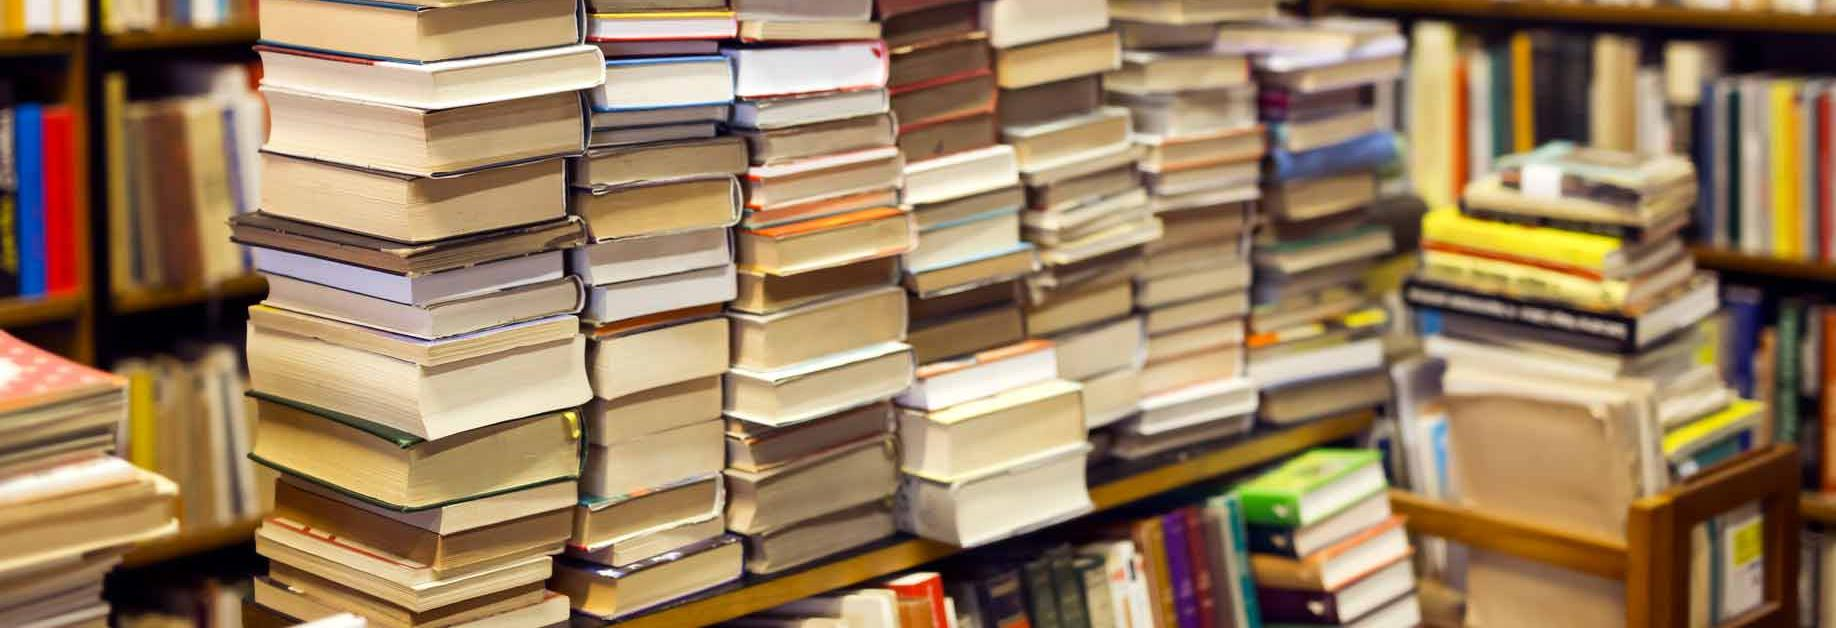 encore used books and comics toledo ohio